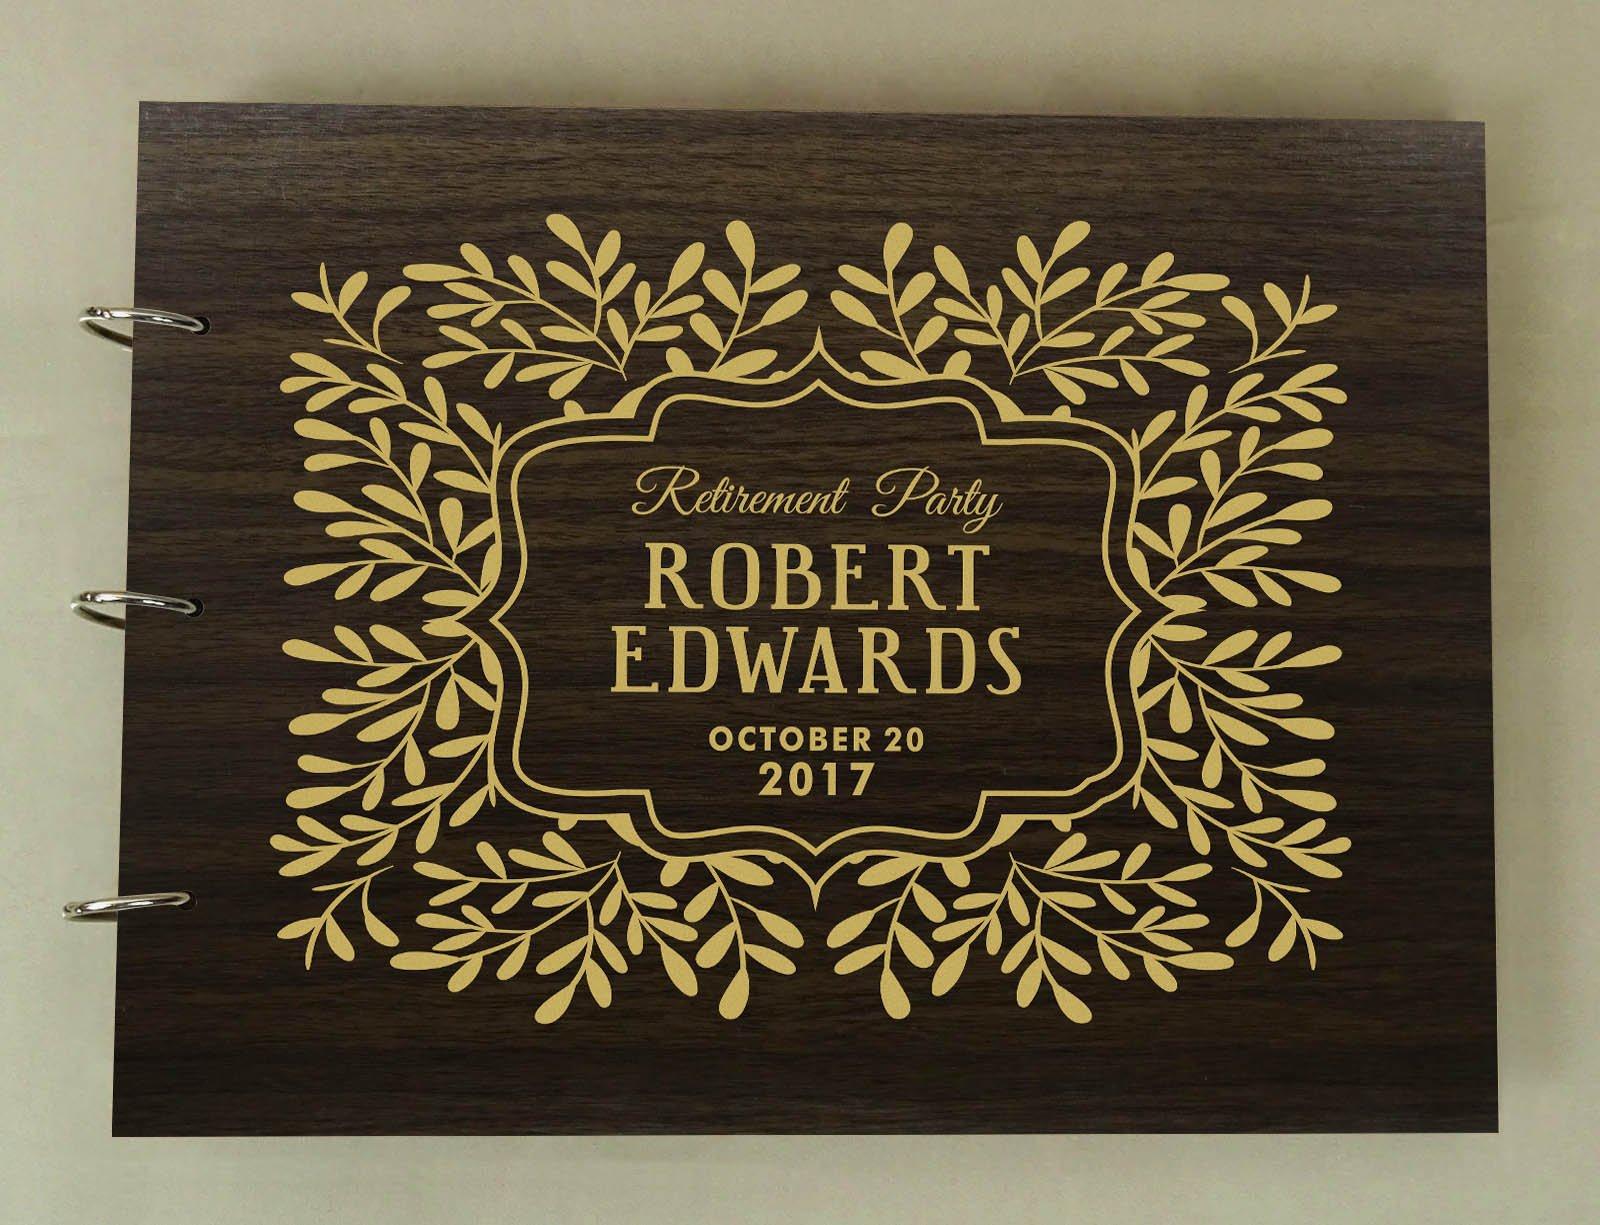 Handmade Custom Guest Book Retirement Party Wood Engraved Photo Album Scrapbook